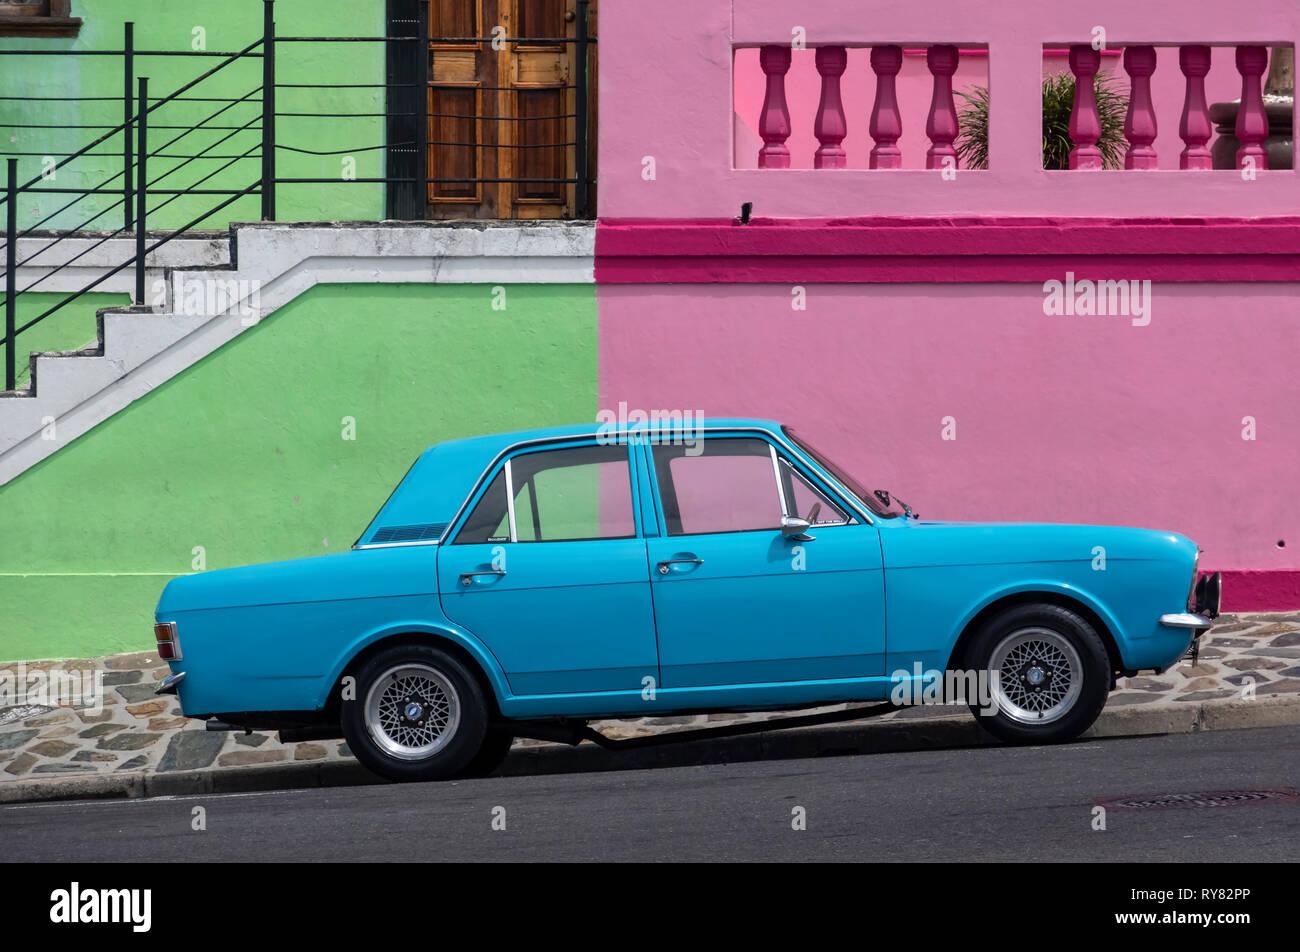 Azul antiguo Ford Cortina coche delante de casas multicolores de Bo Kaap, Ciudad del Cabo, Western Cape, Sudáfrica Foto de stock